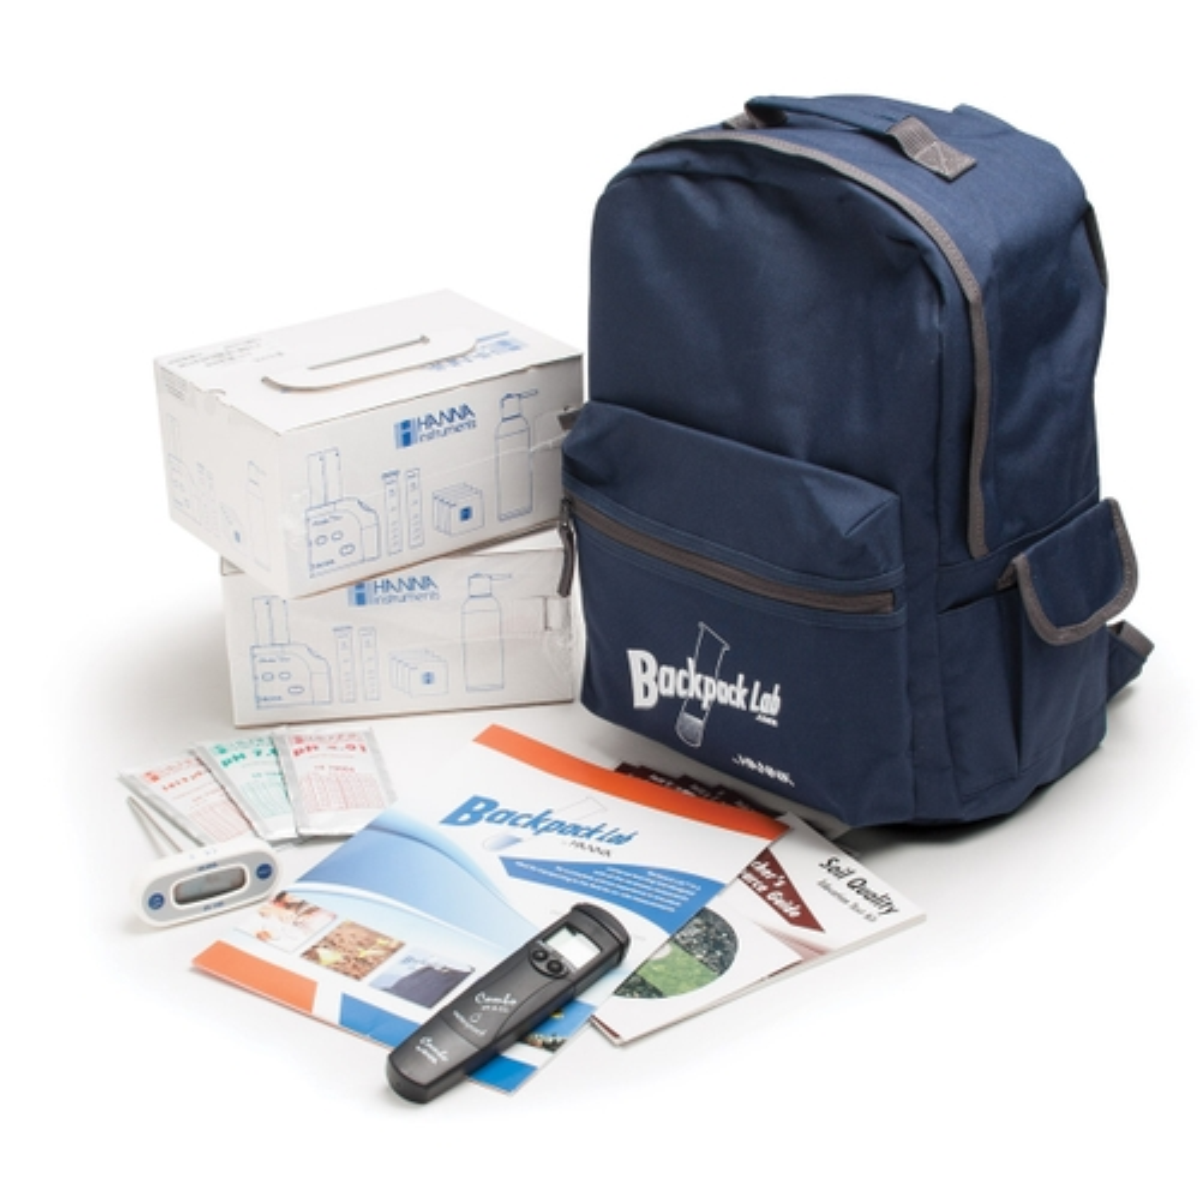 HI3896BP Backpack Lab Soil Quality Educational Test Kit